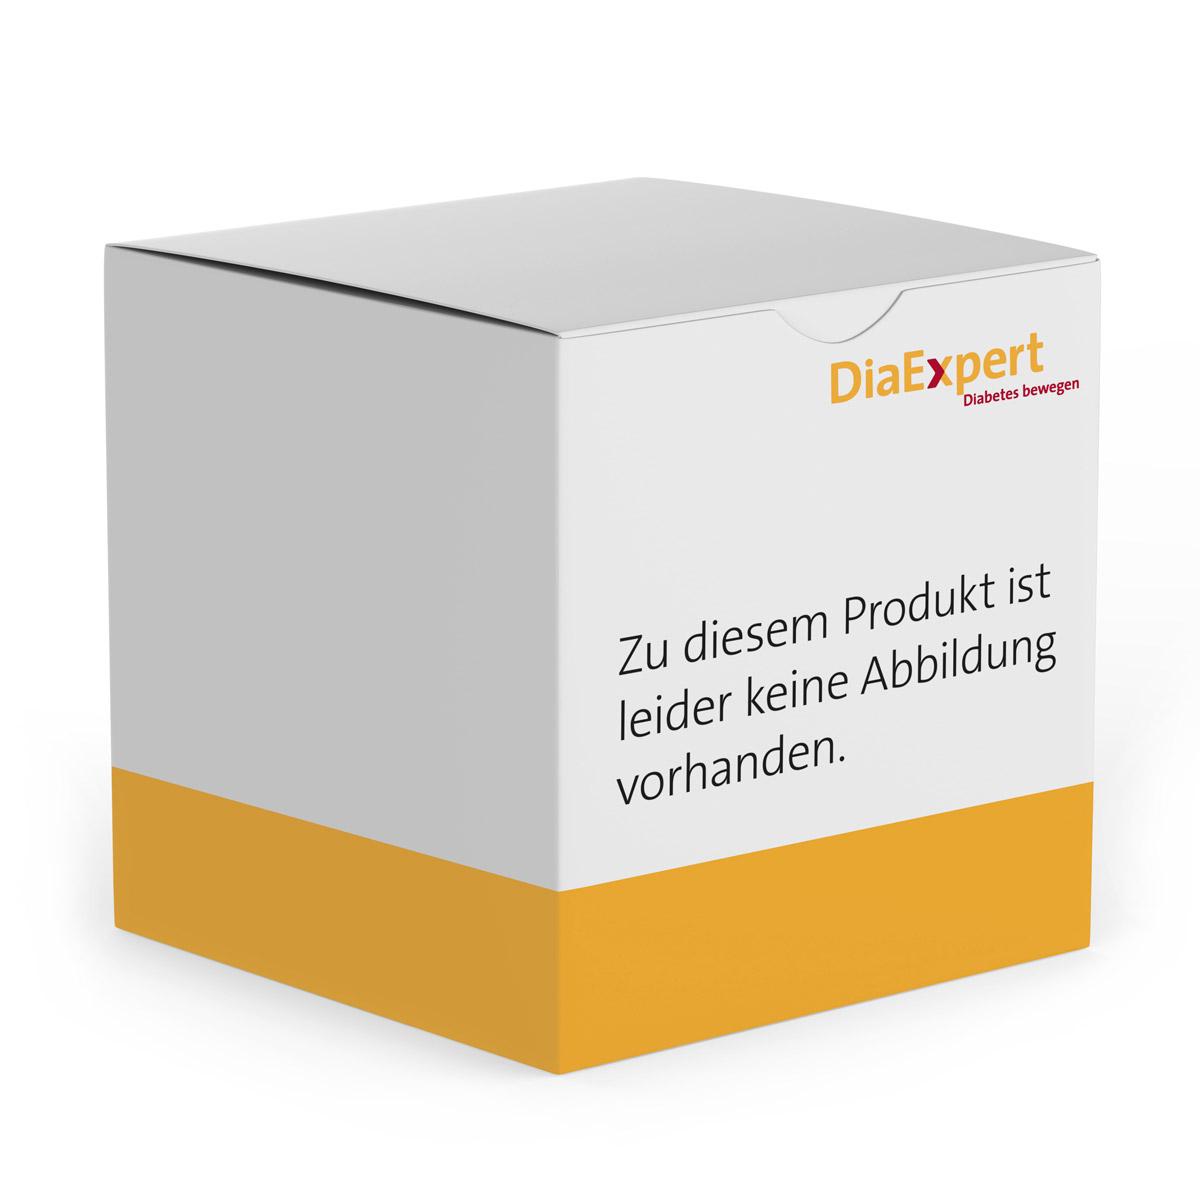 OneTouch Select Plus Set mmol/L